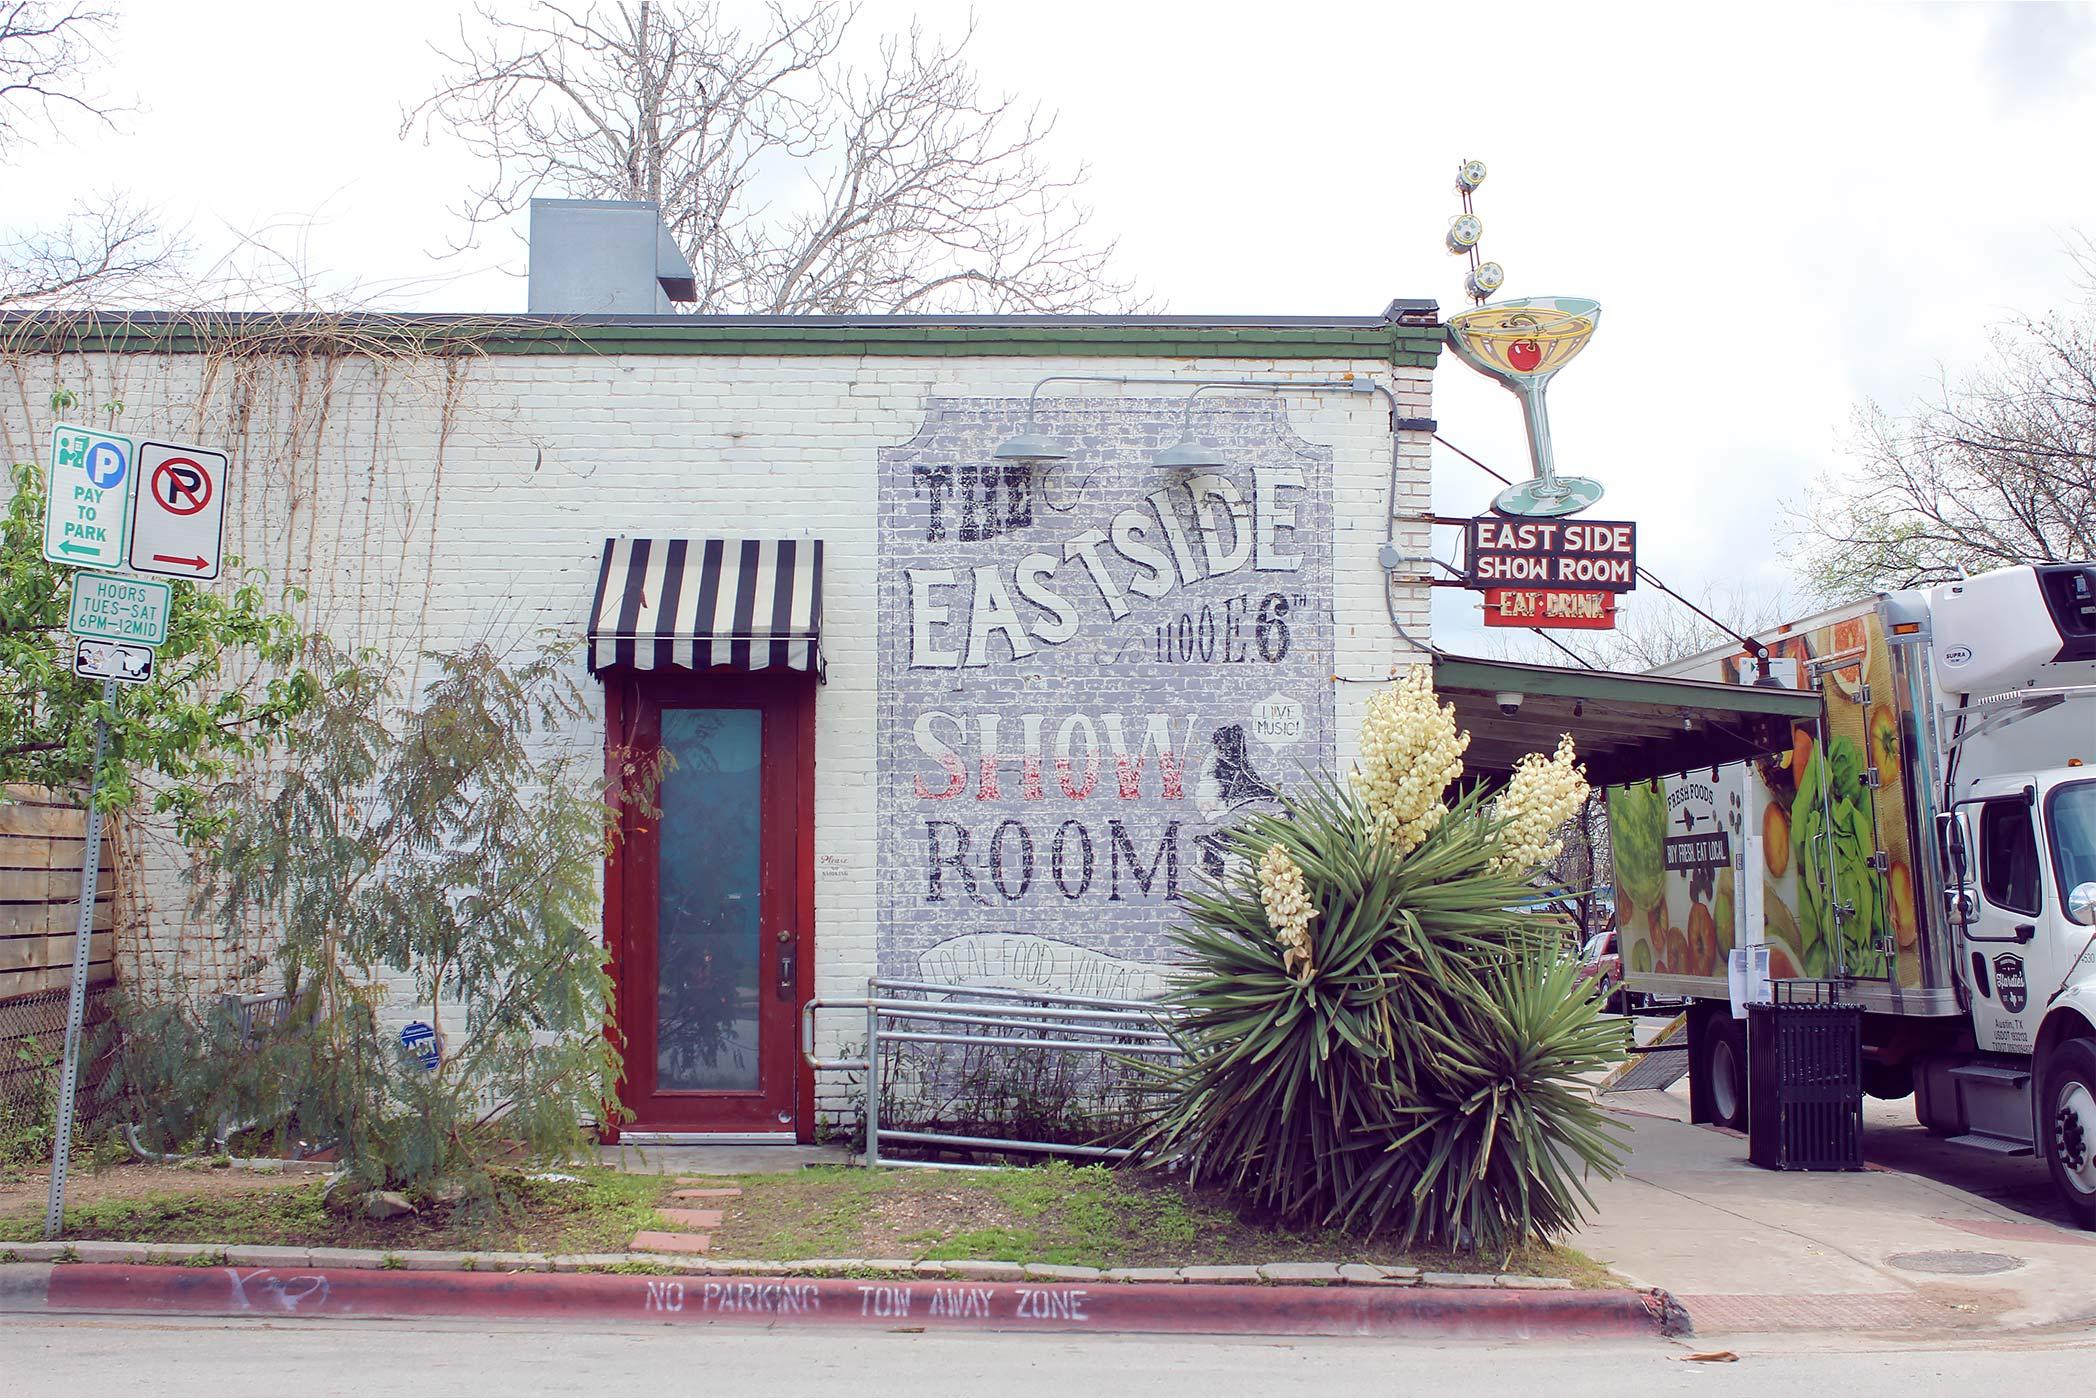 The Eastside Showroom, East 6th Street